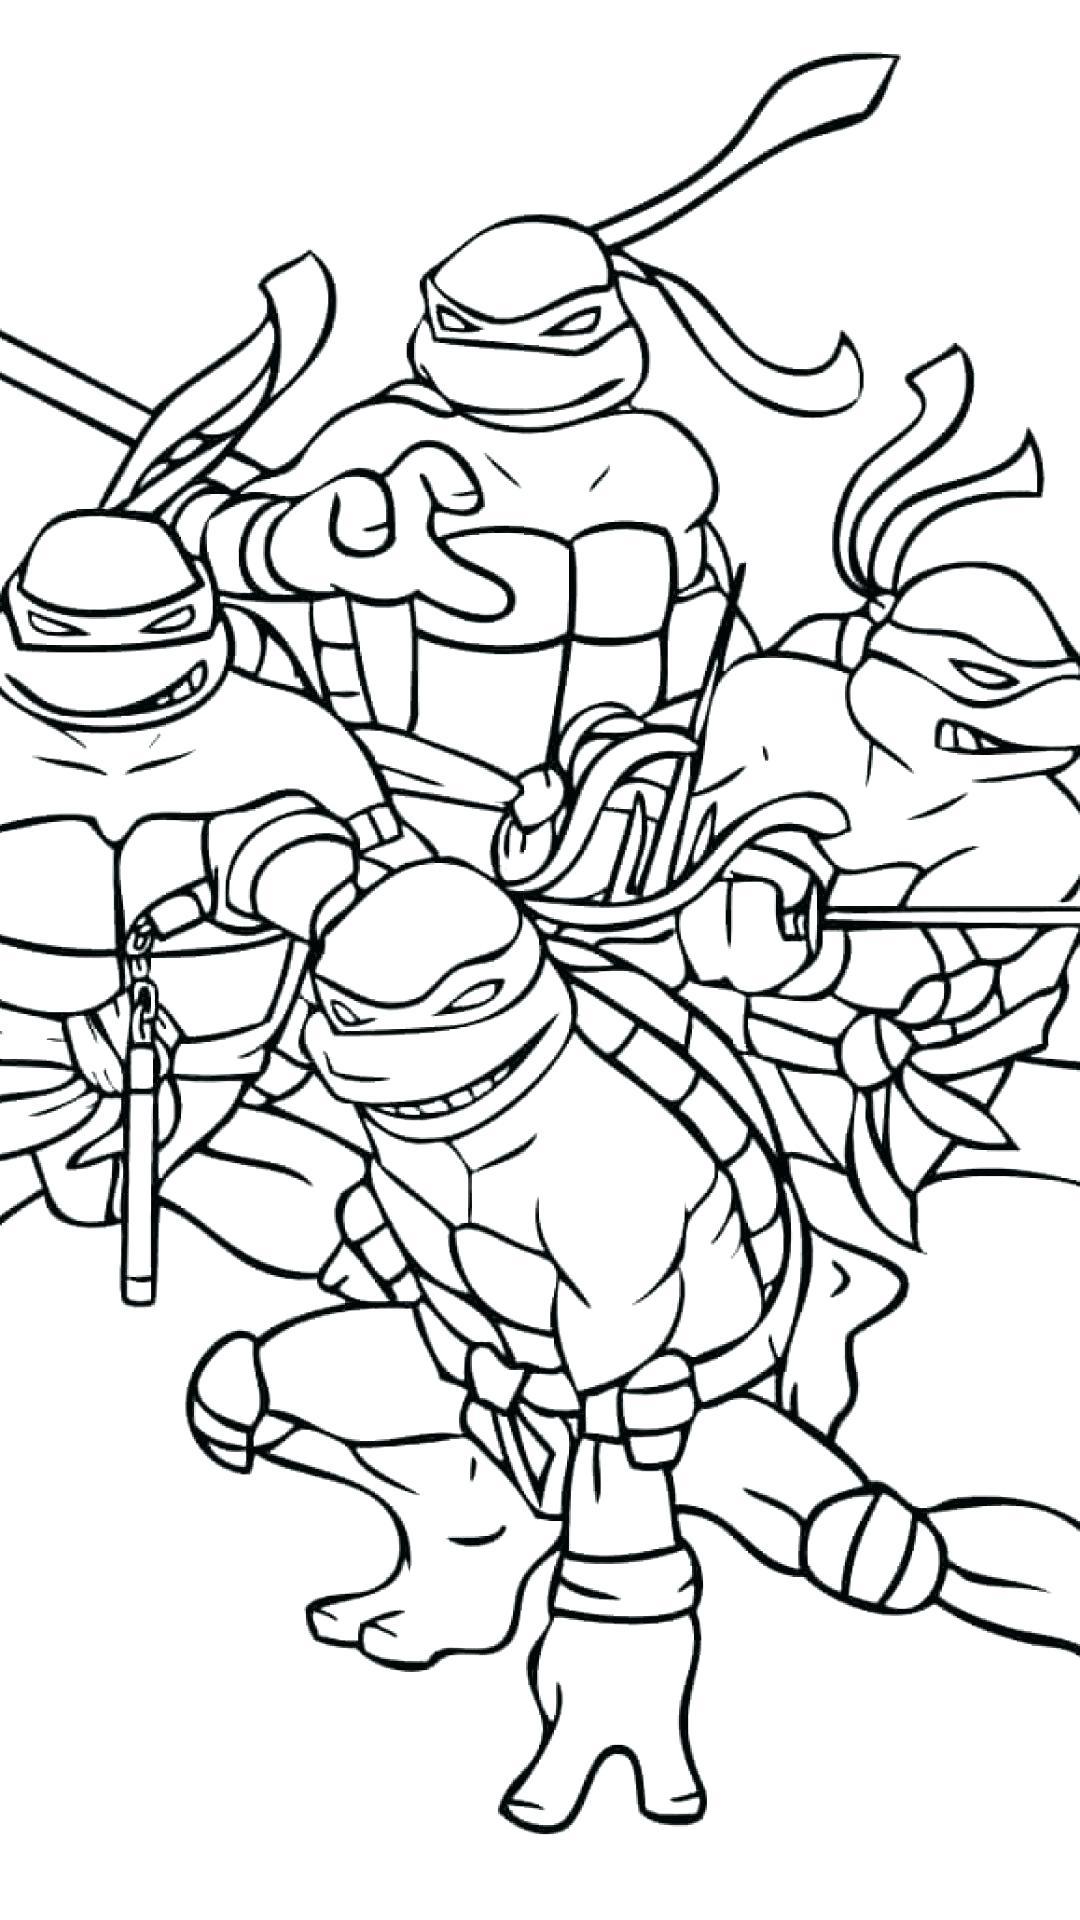 Ninja Turtle Head Drawing at GetDrawings.com   Free for personal use ...